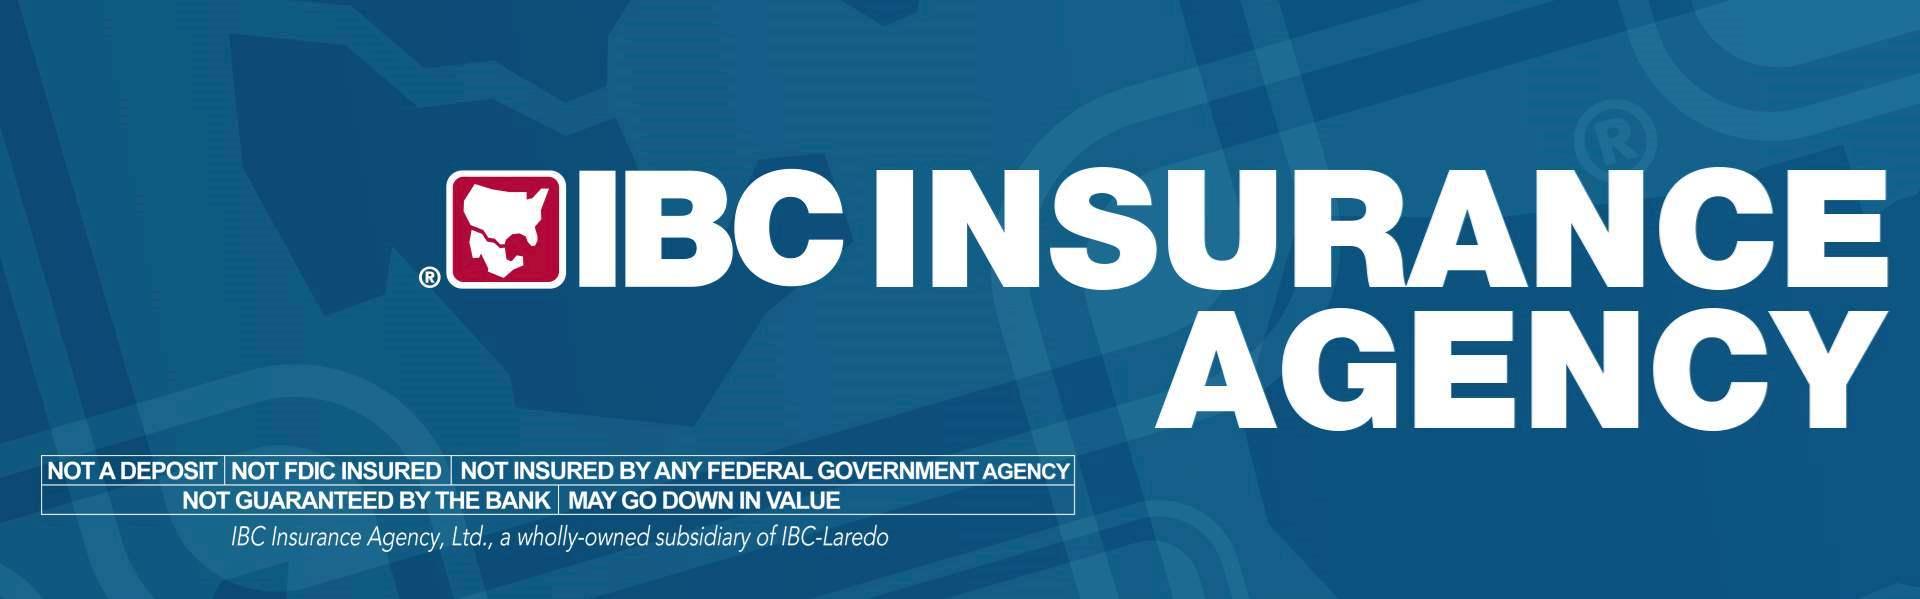 IBC Bank Business Insurance